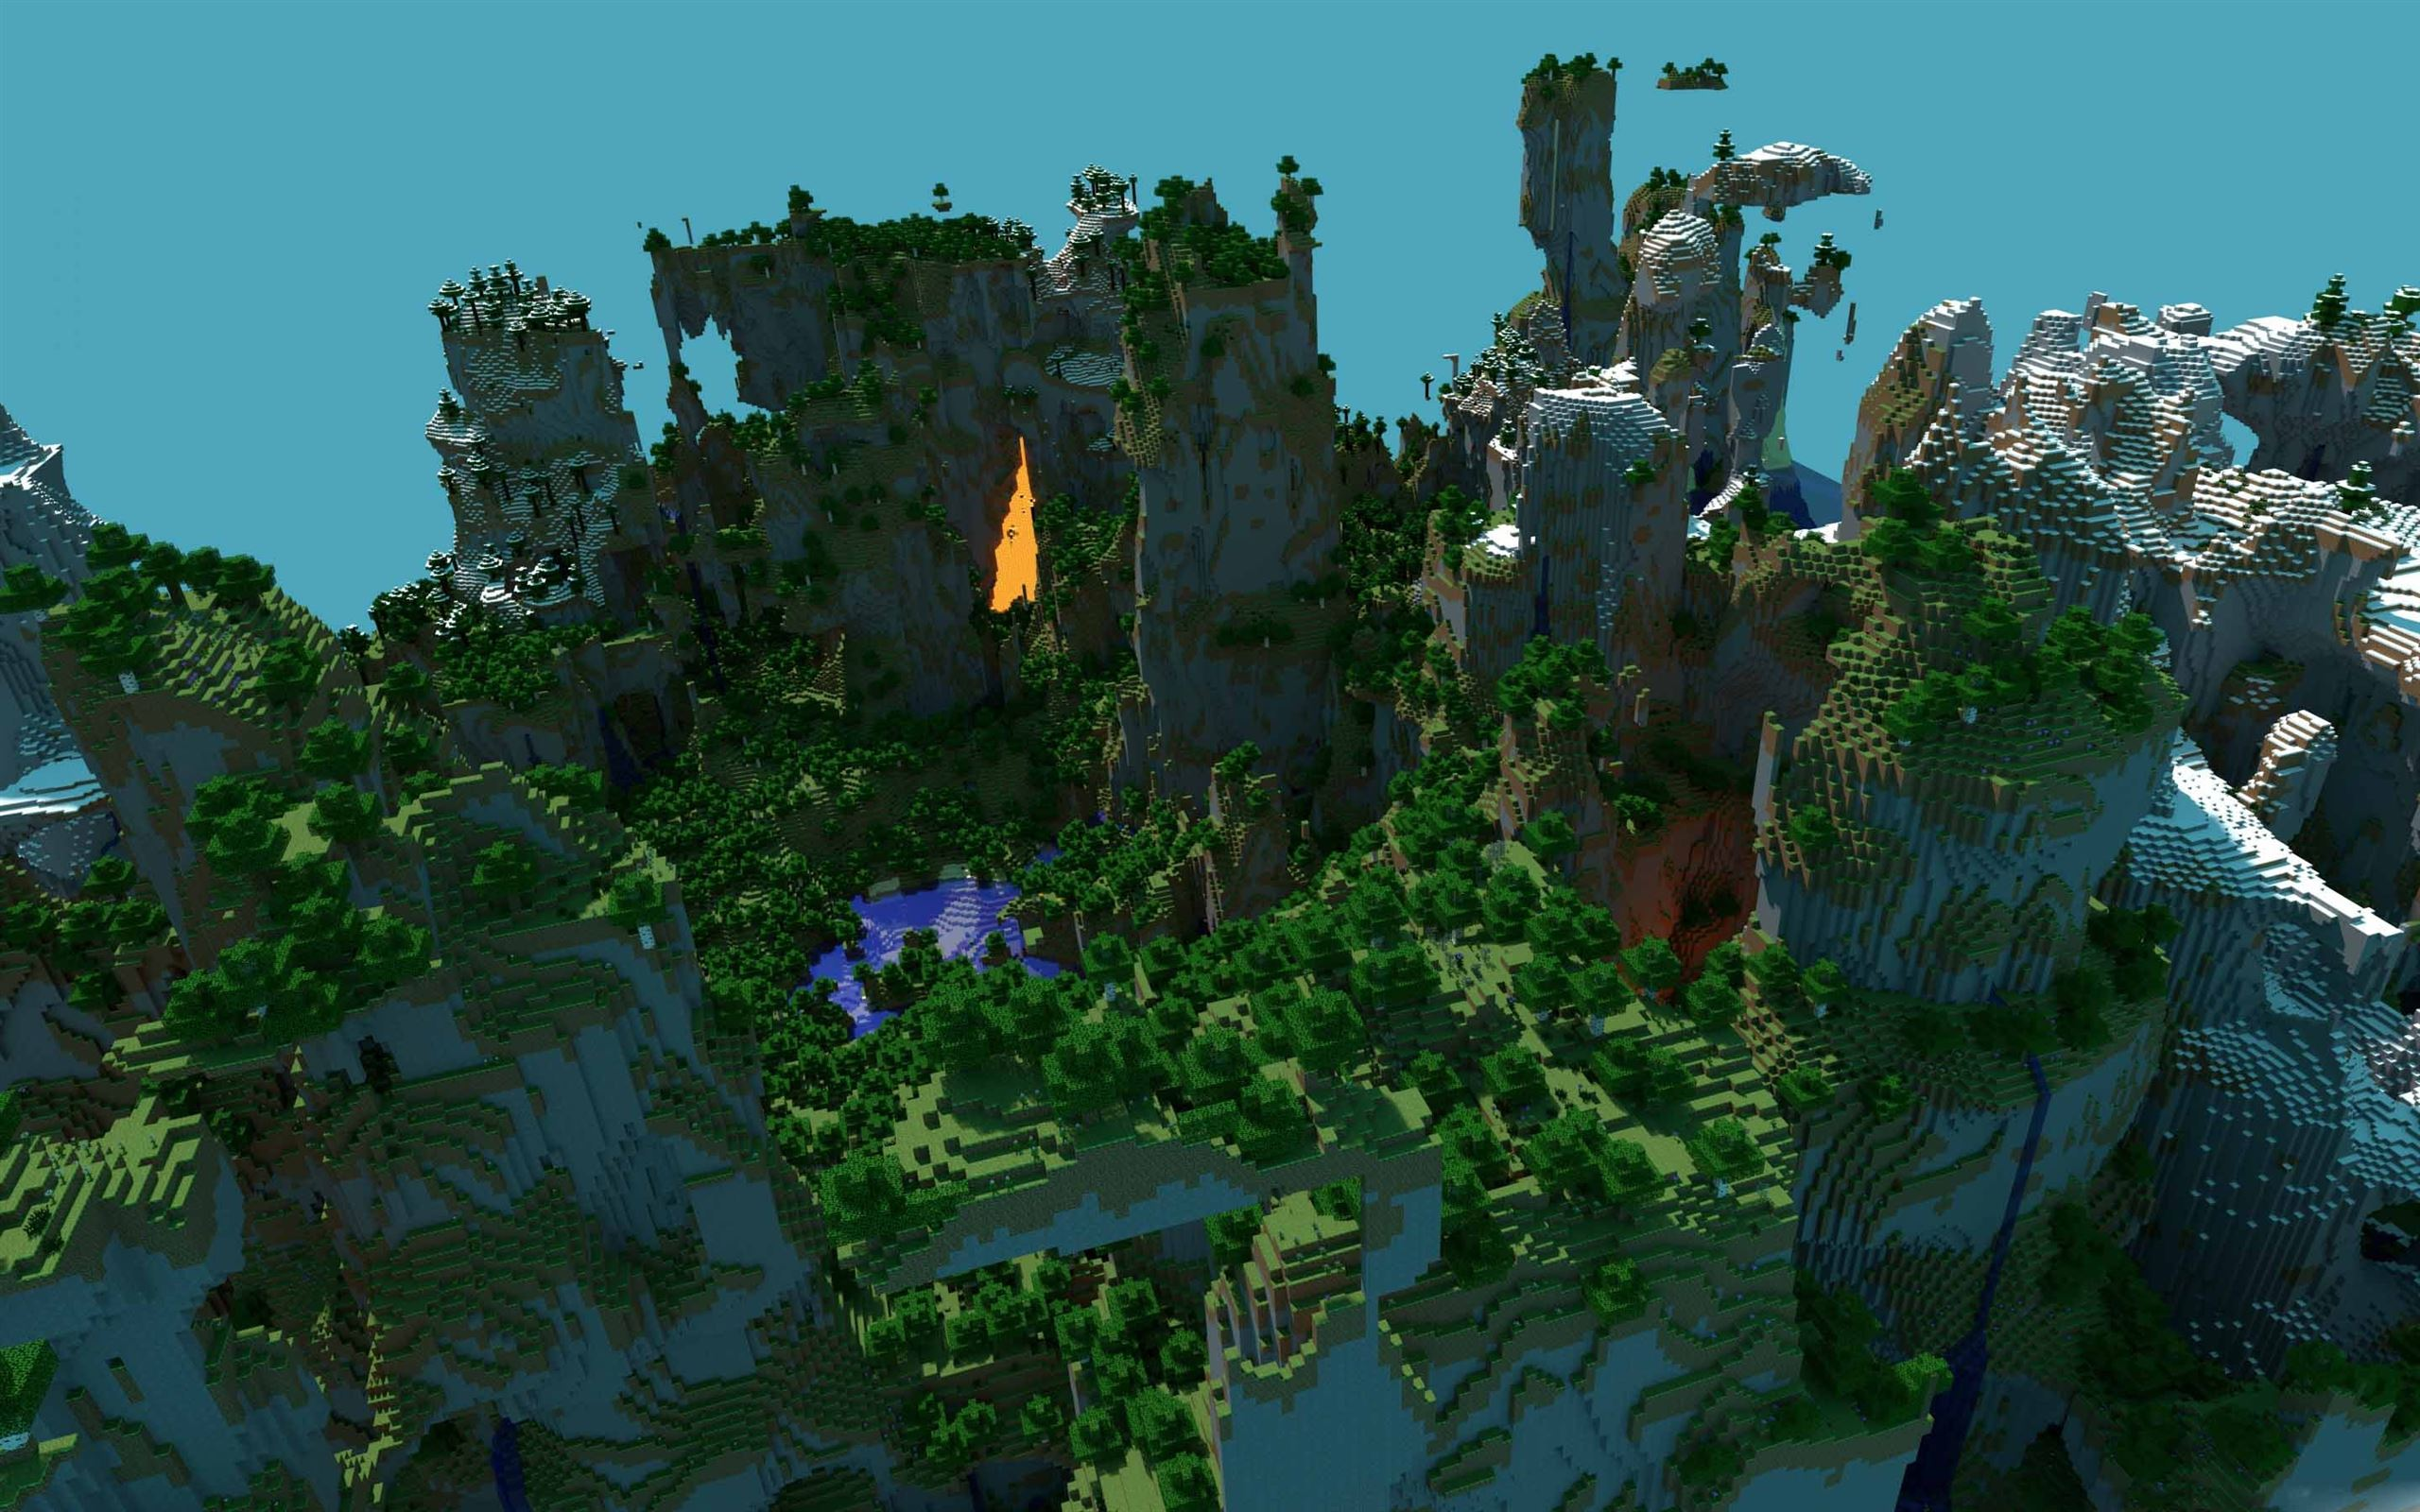 minecraft landscape mac wallpaper download | free mac wallpapers